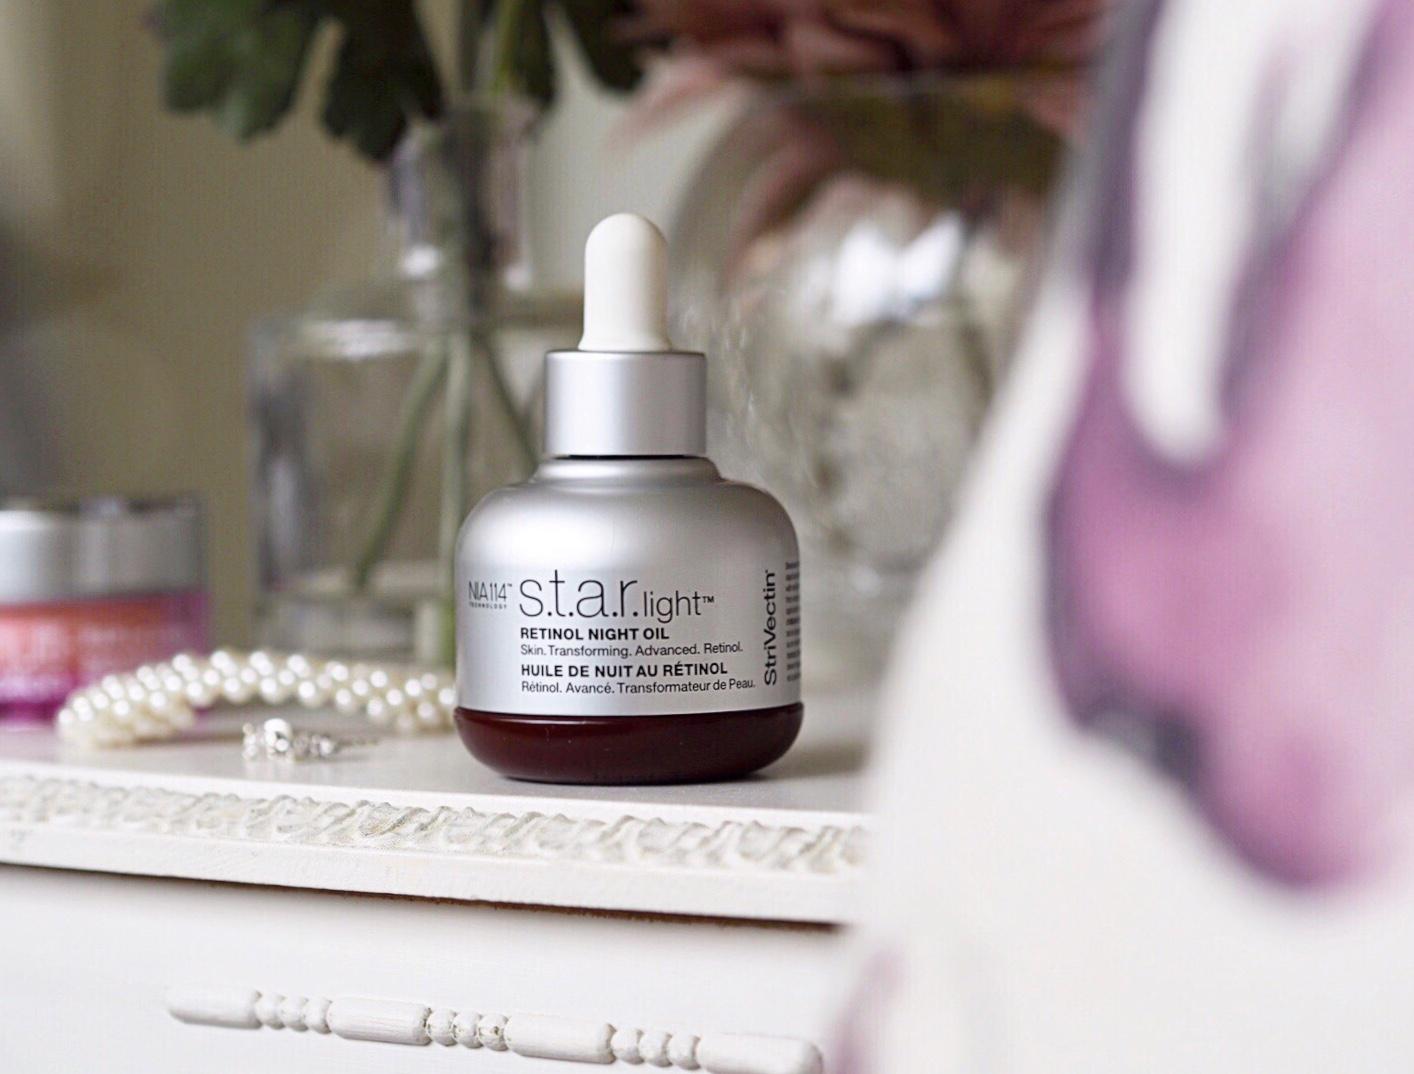 StriVectin Skin Transforming Retinol S.T.A.R. Light Night Oil The Beauty Spyglass